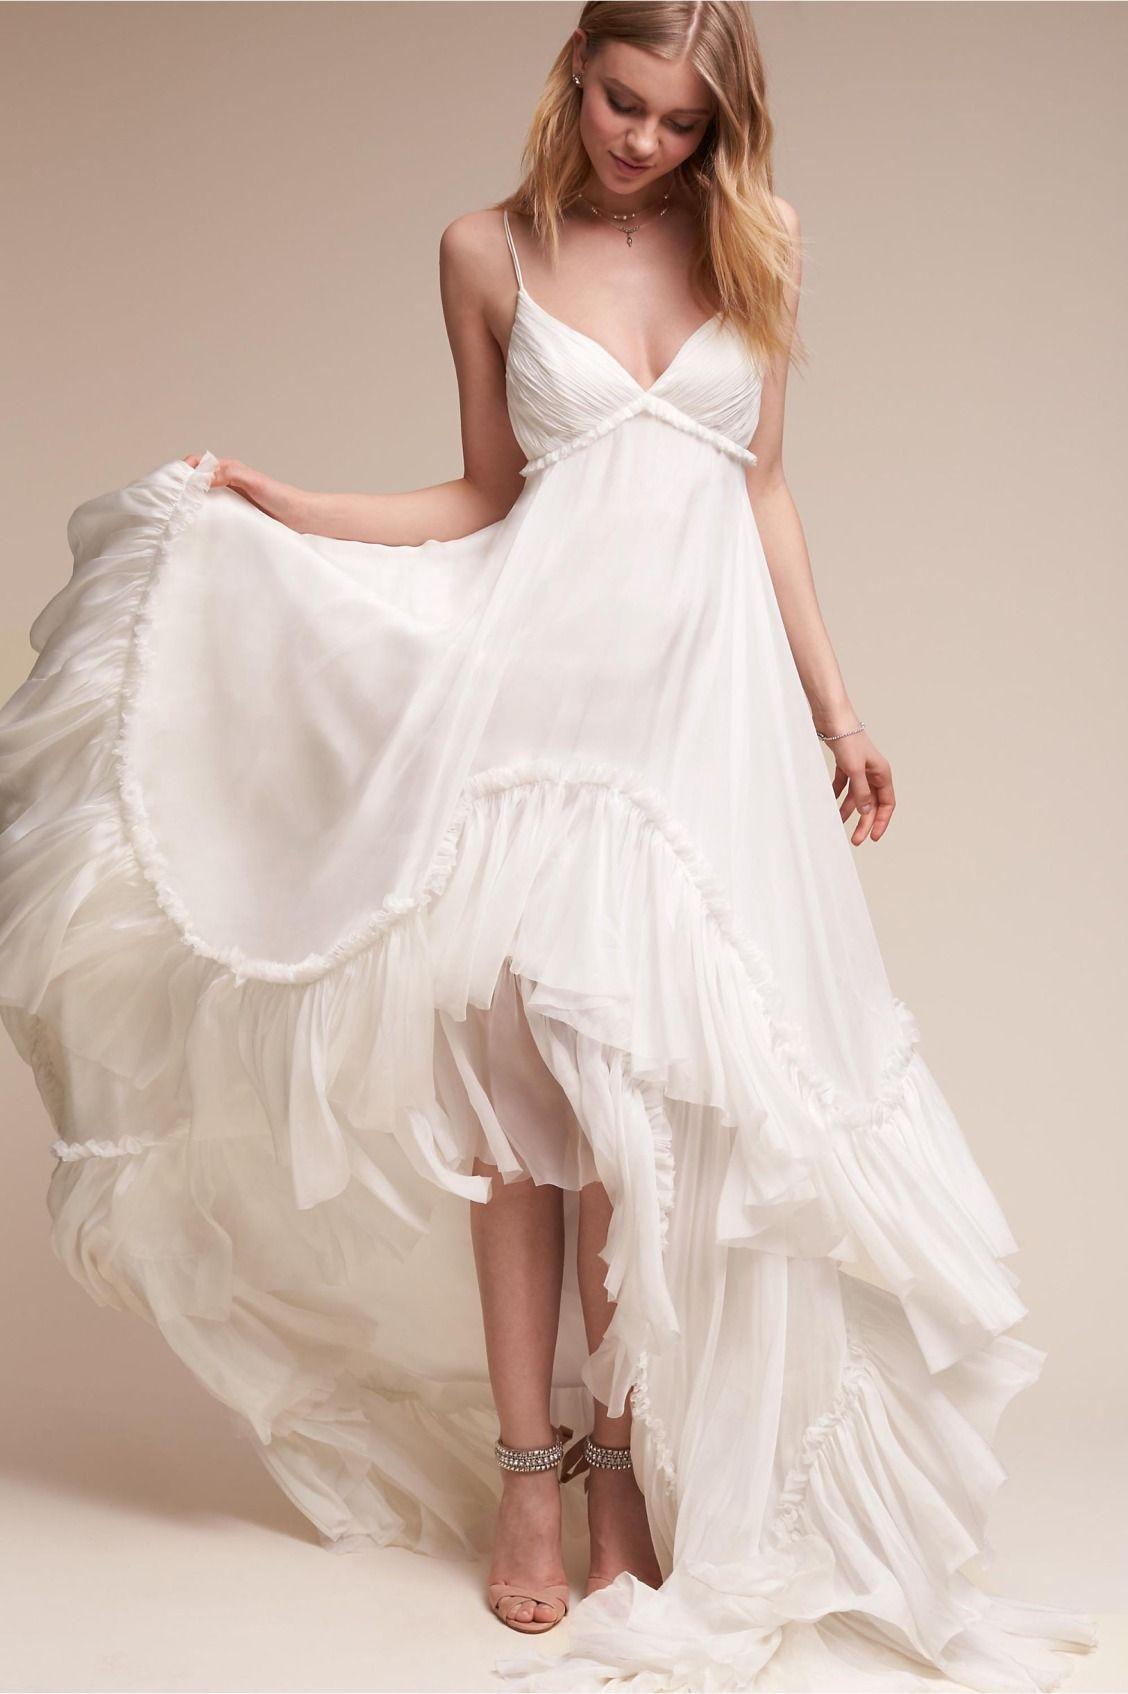 Airy Silk Chiffon Soie Gown From Bhldn Casual Wedding Dress Romantic Bohemian Wedding Dresses Beach Wedding Dress